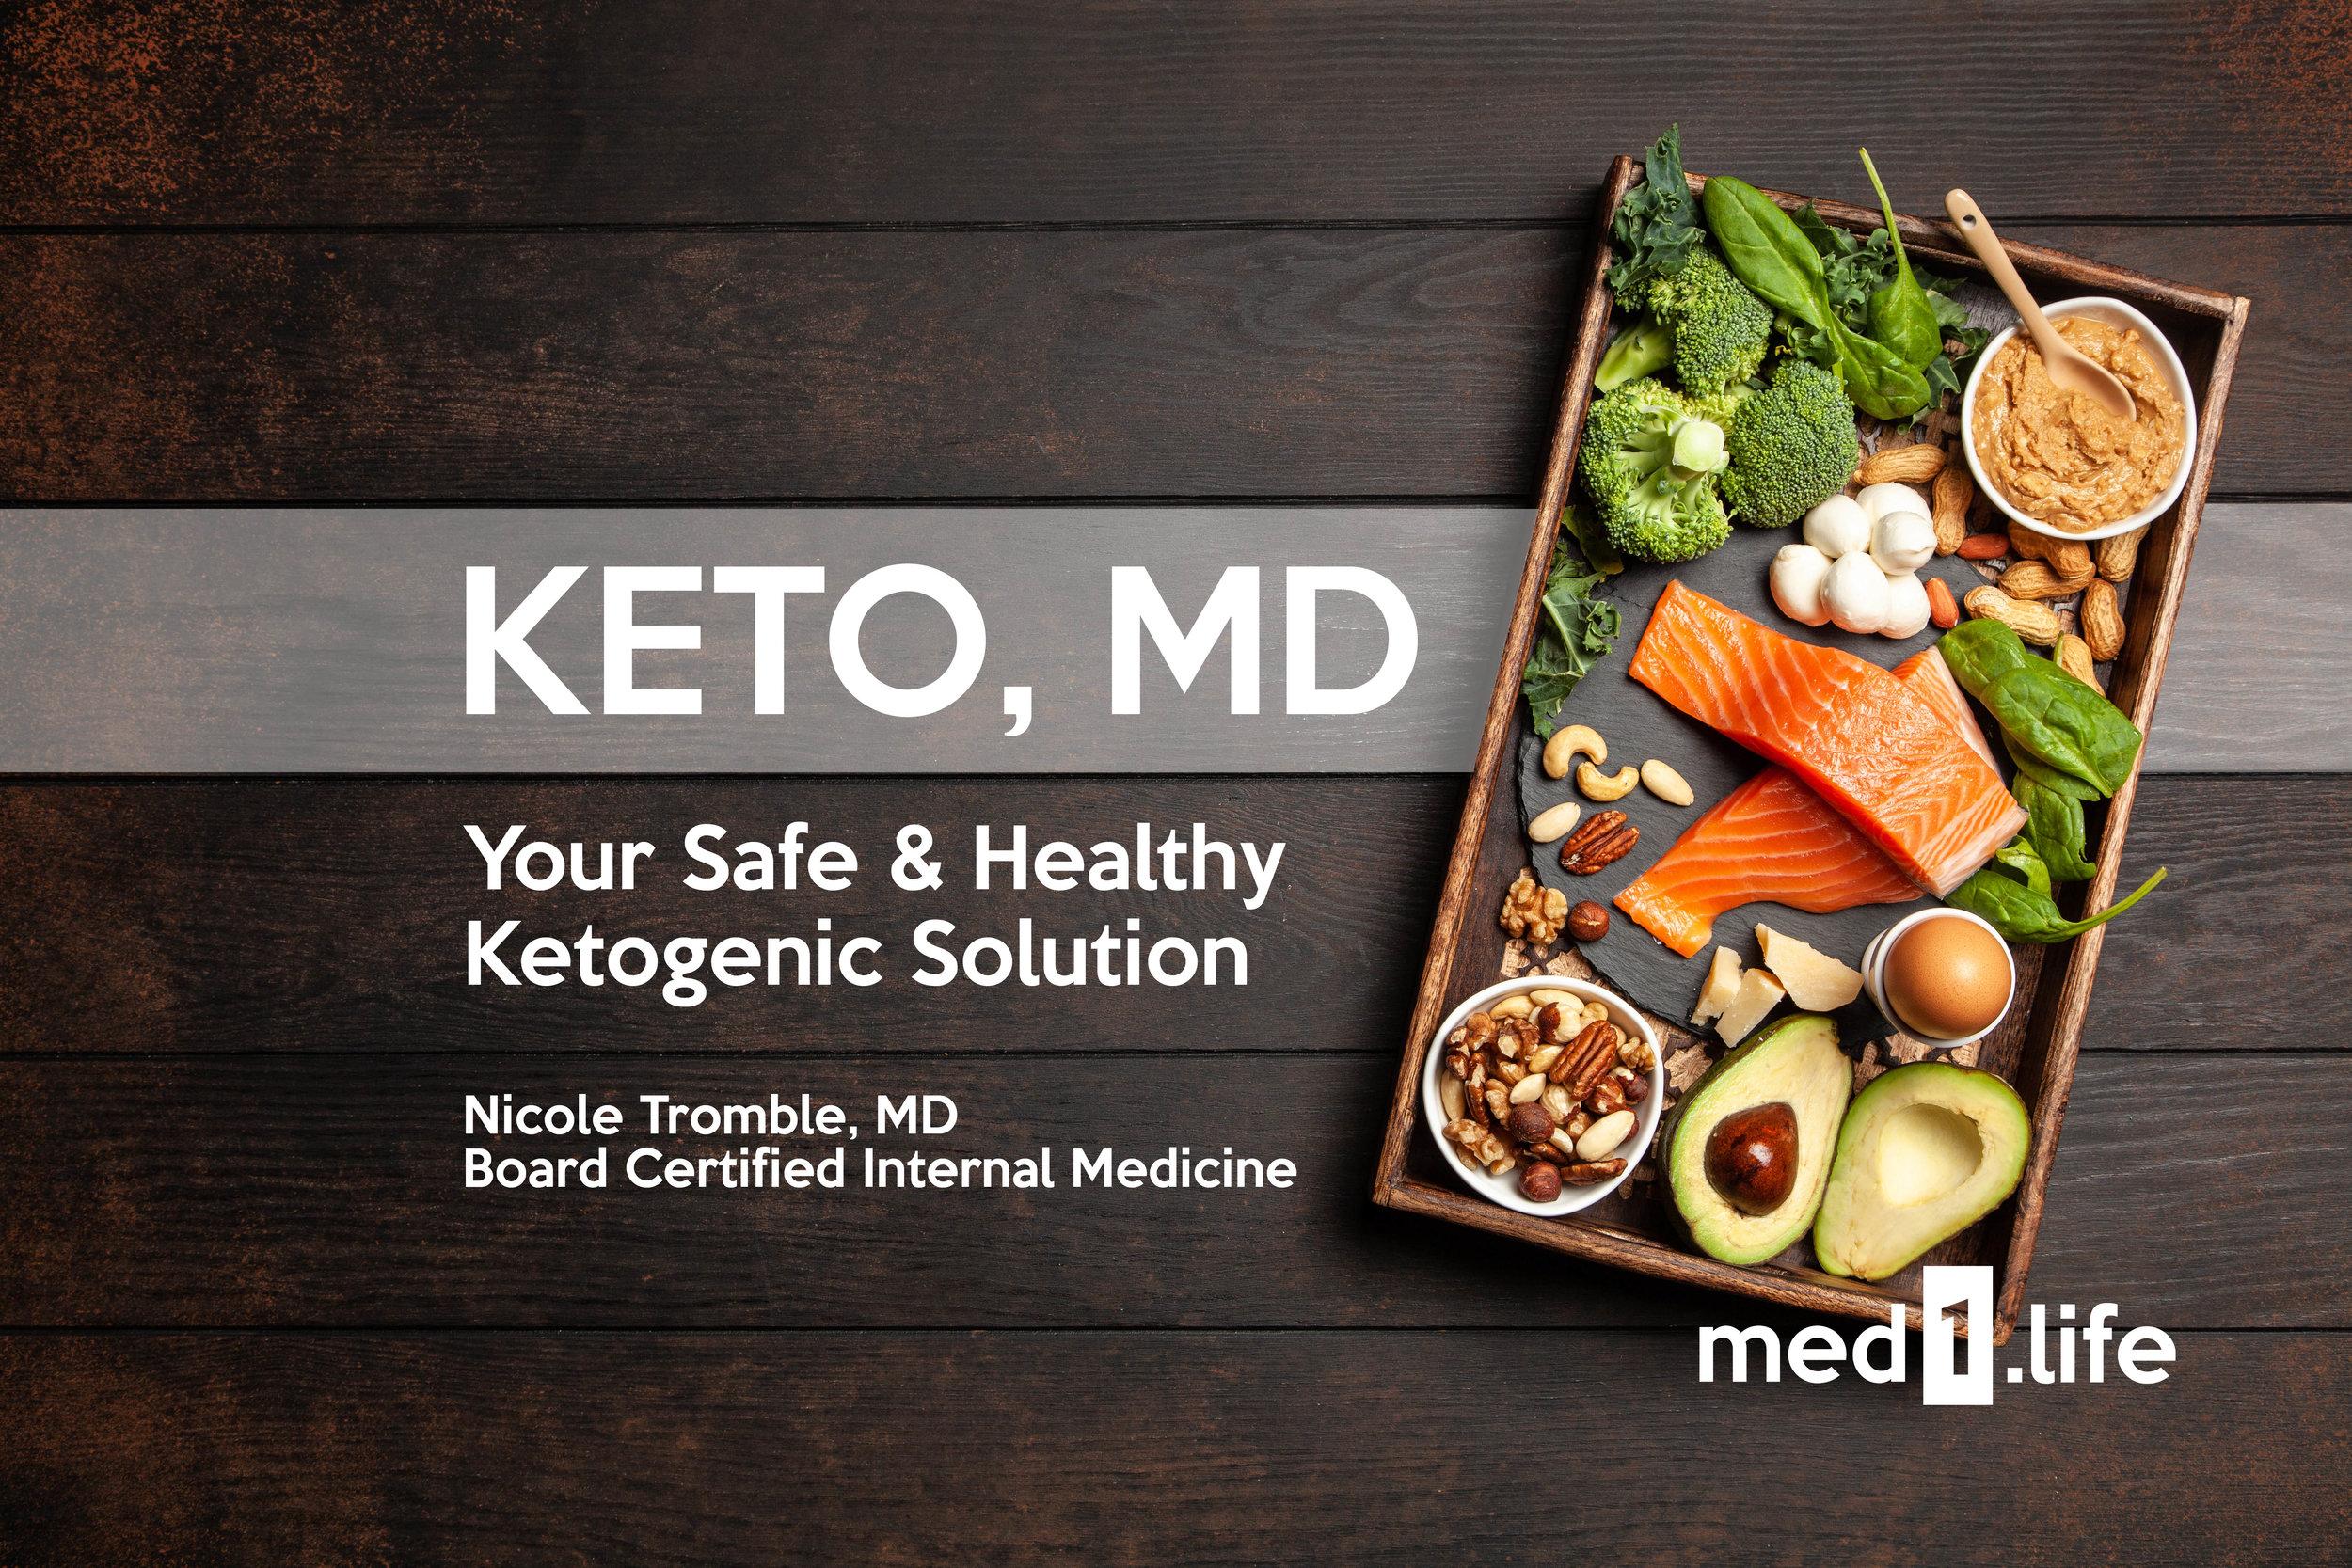 Keto, MD image cover.jpg